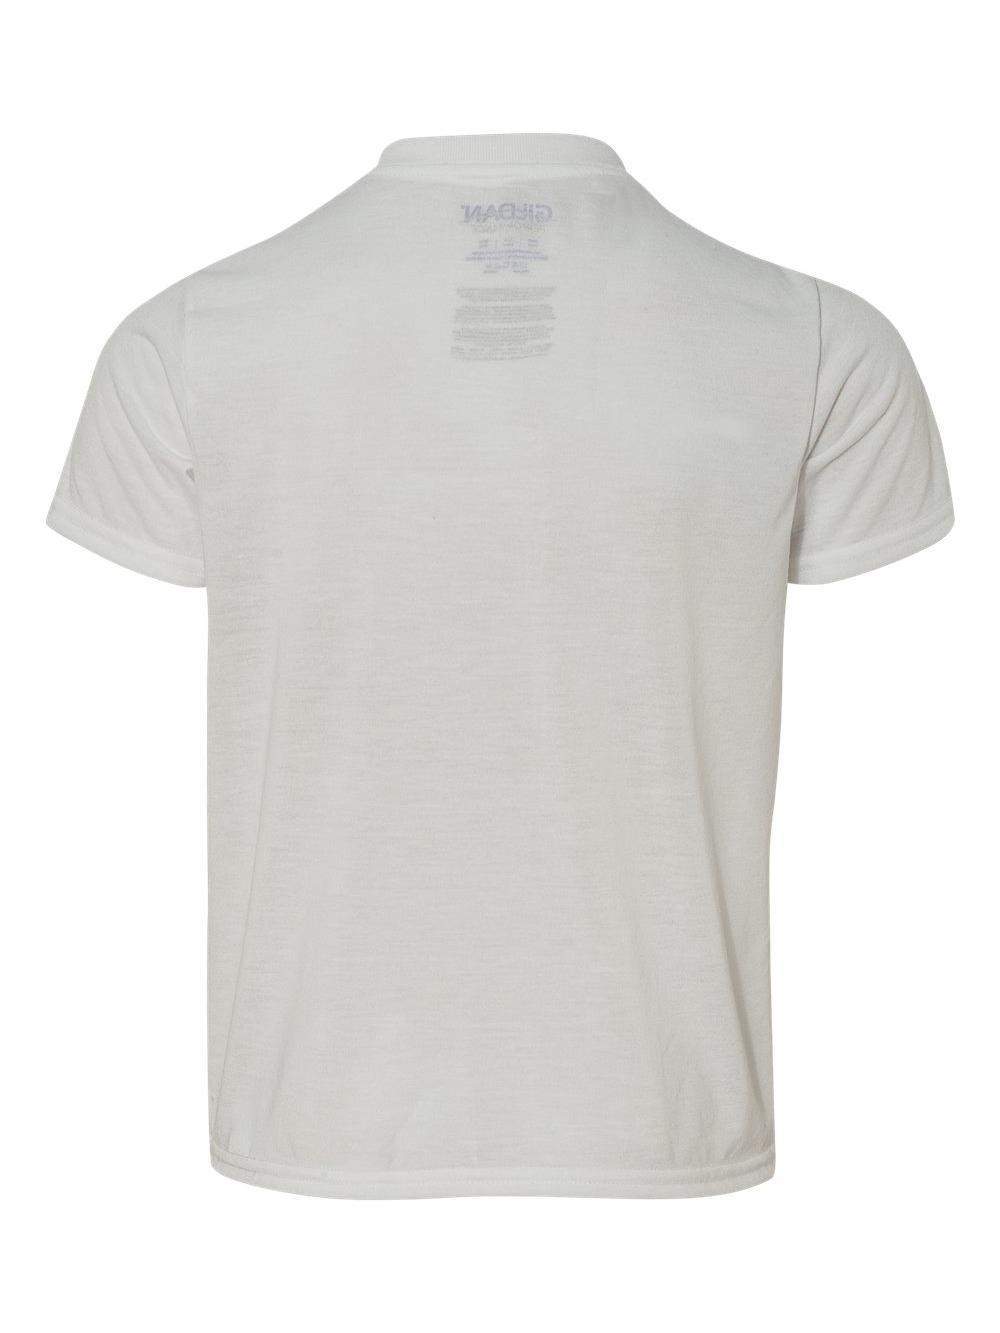 Gildan-Performance-Youth-T-Shirt-42000B thumbnail 25